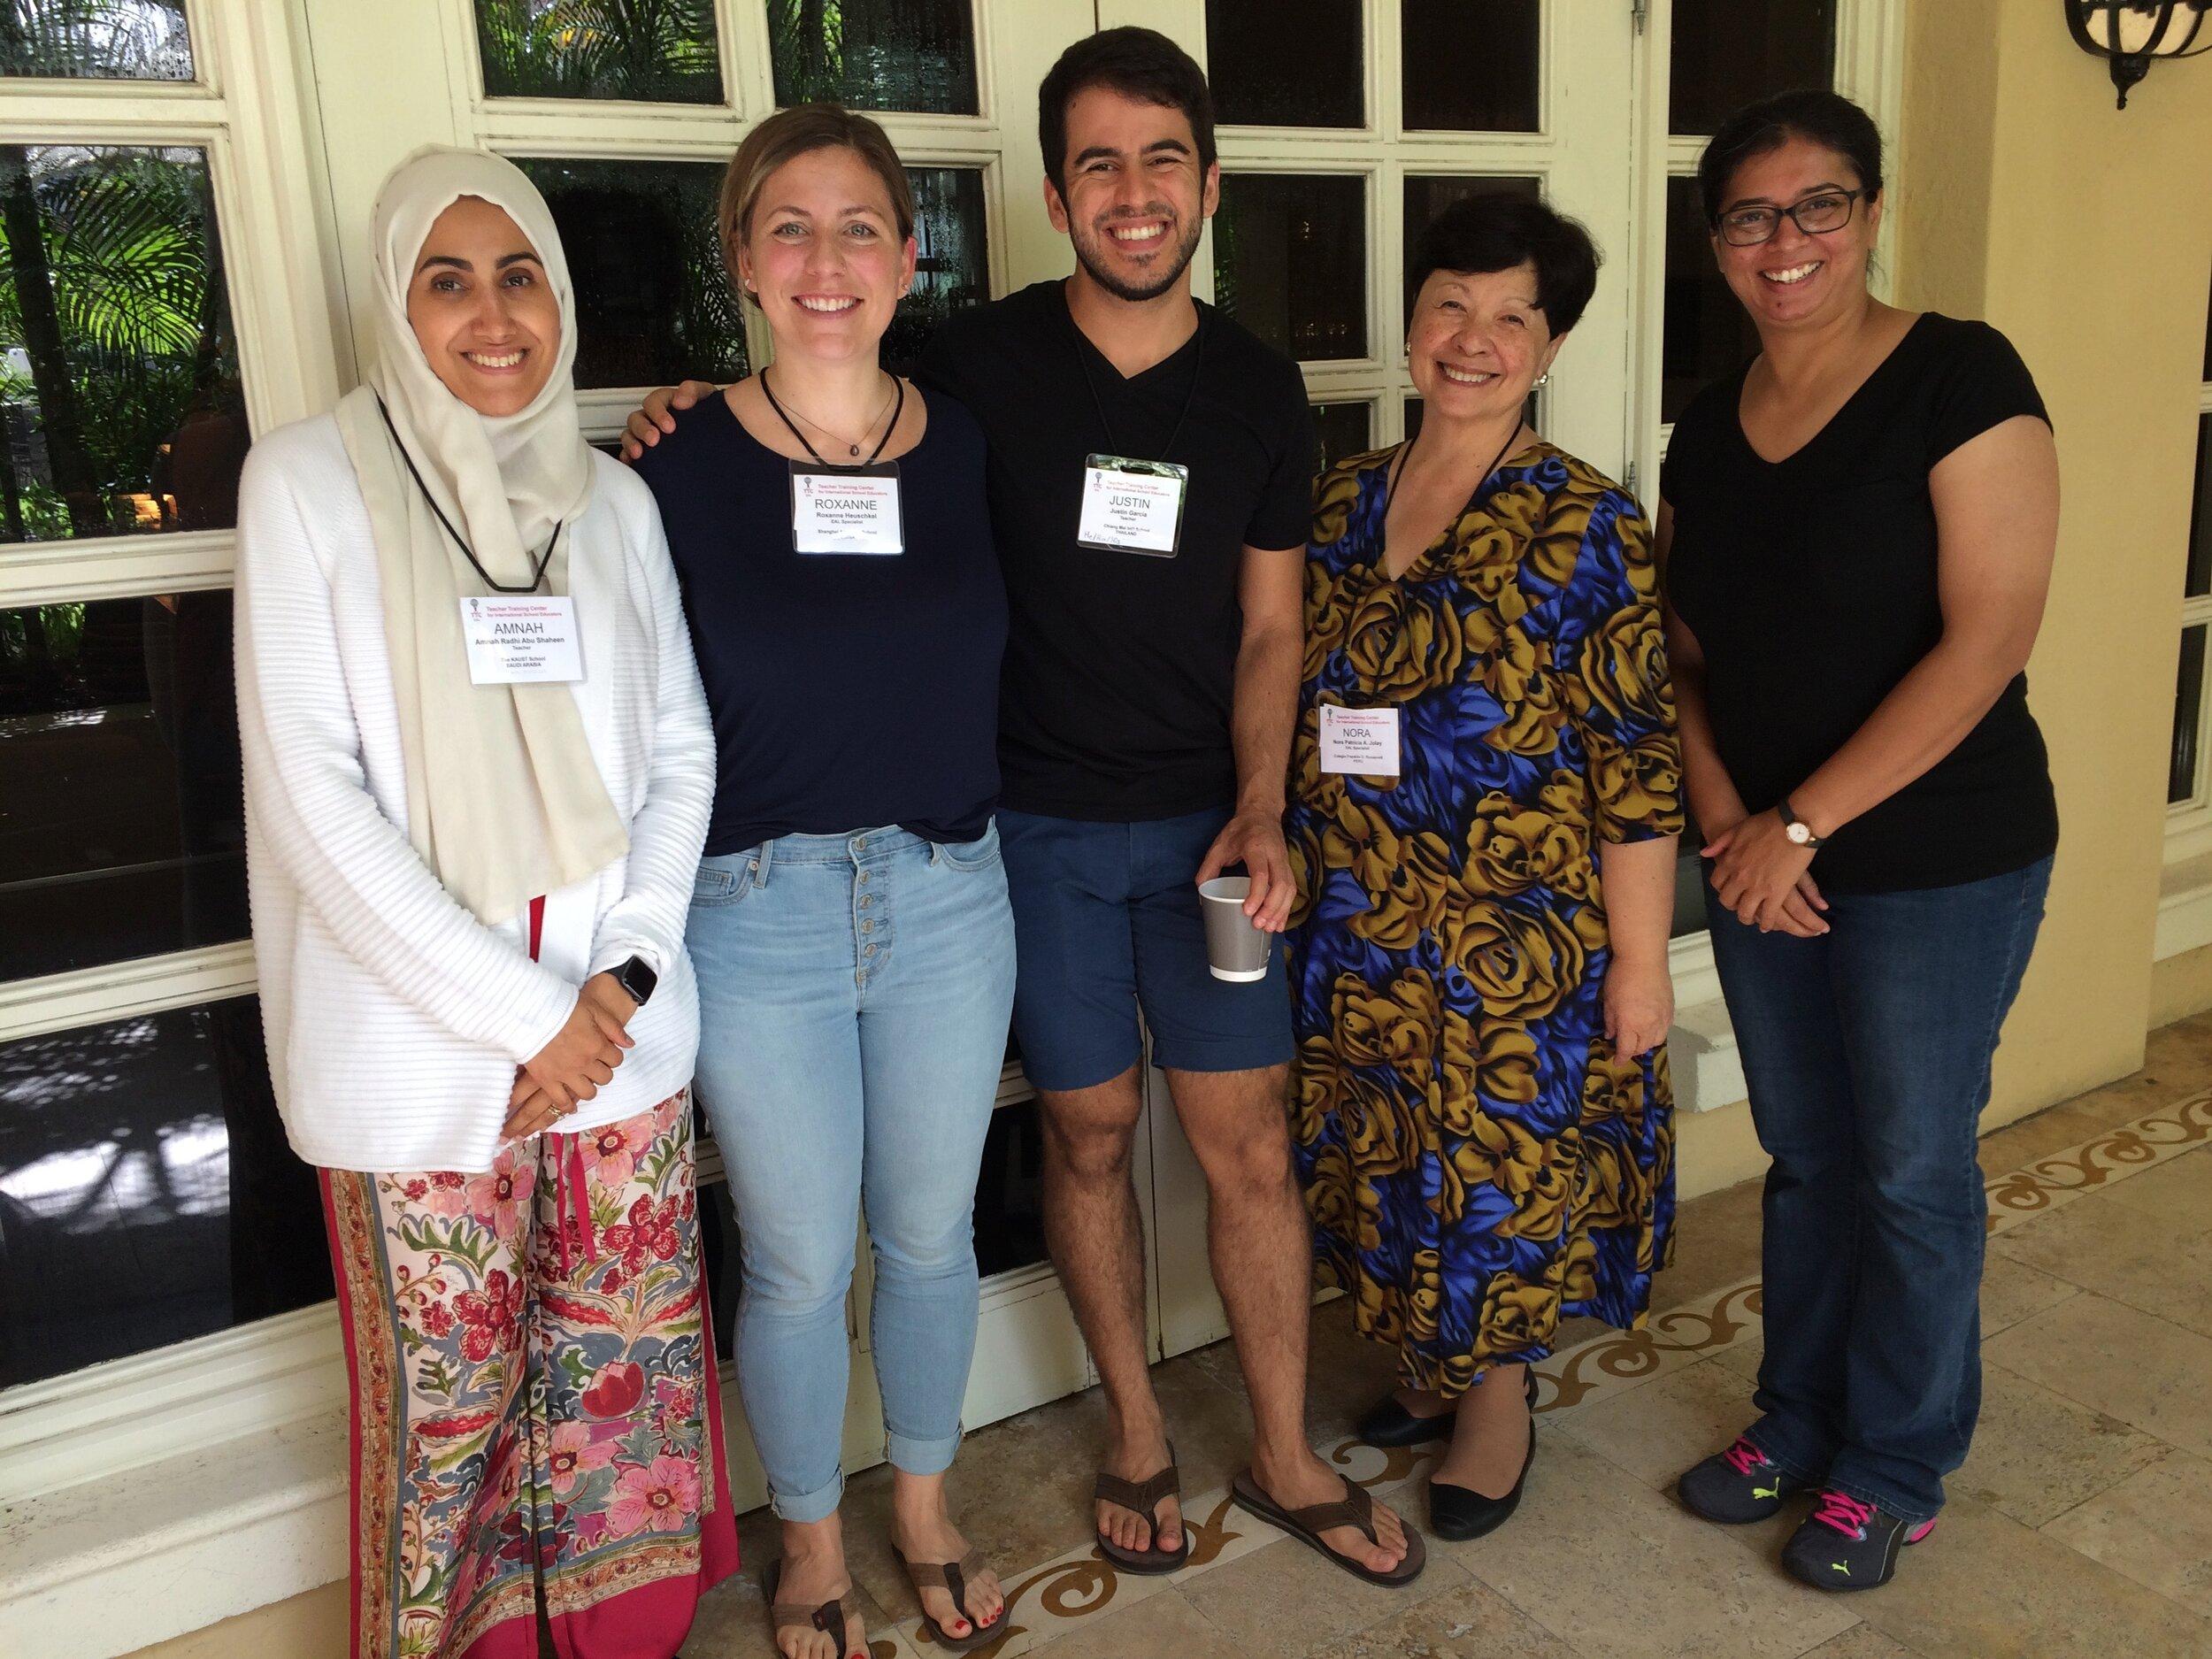 Amnah Abu Shaheen, Roxanne Heuschkel, Justin Garcia, Nora Jolay Koo, and Anu Chakraborty EAL.jpeg